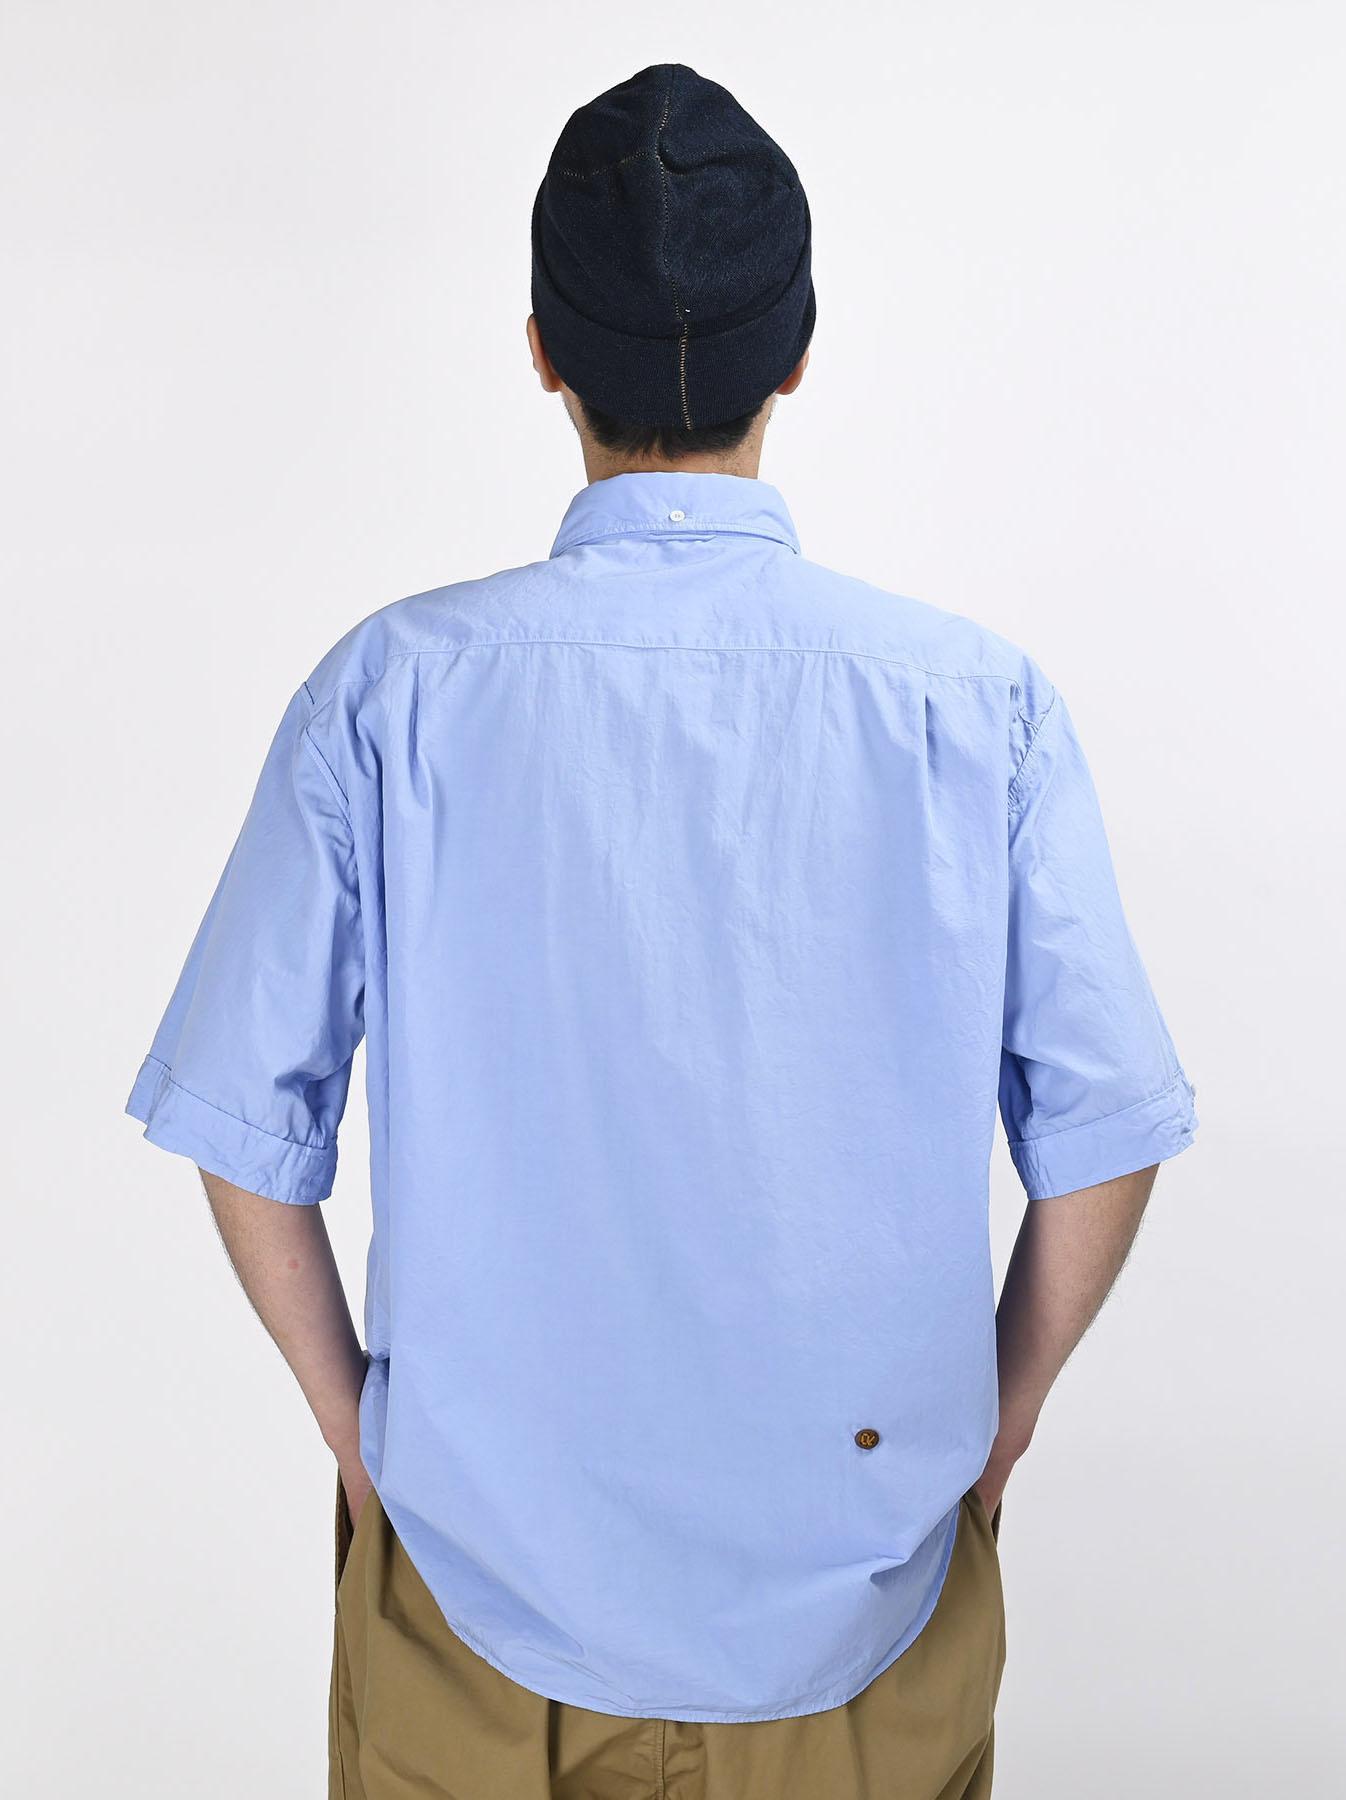 Damp Cotton Anuenue Ocean Shirt (0621)-7